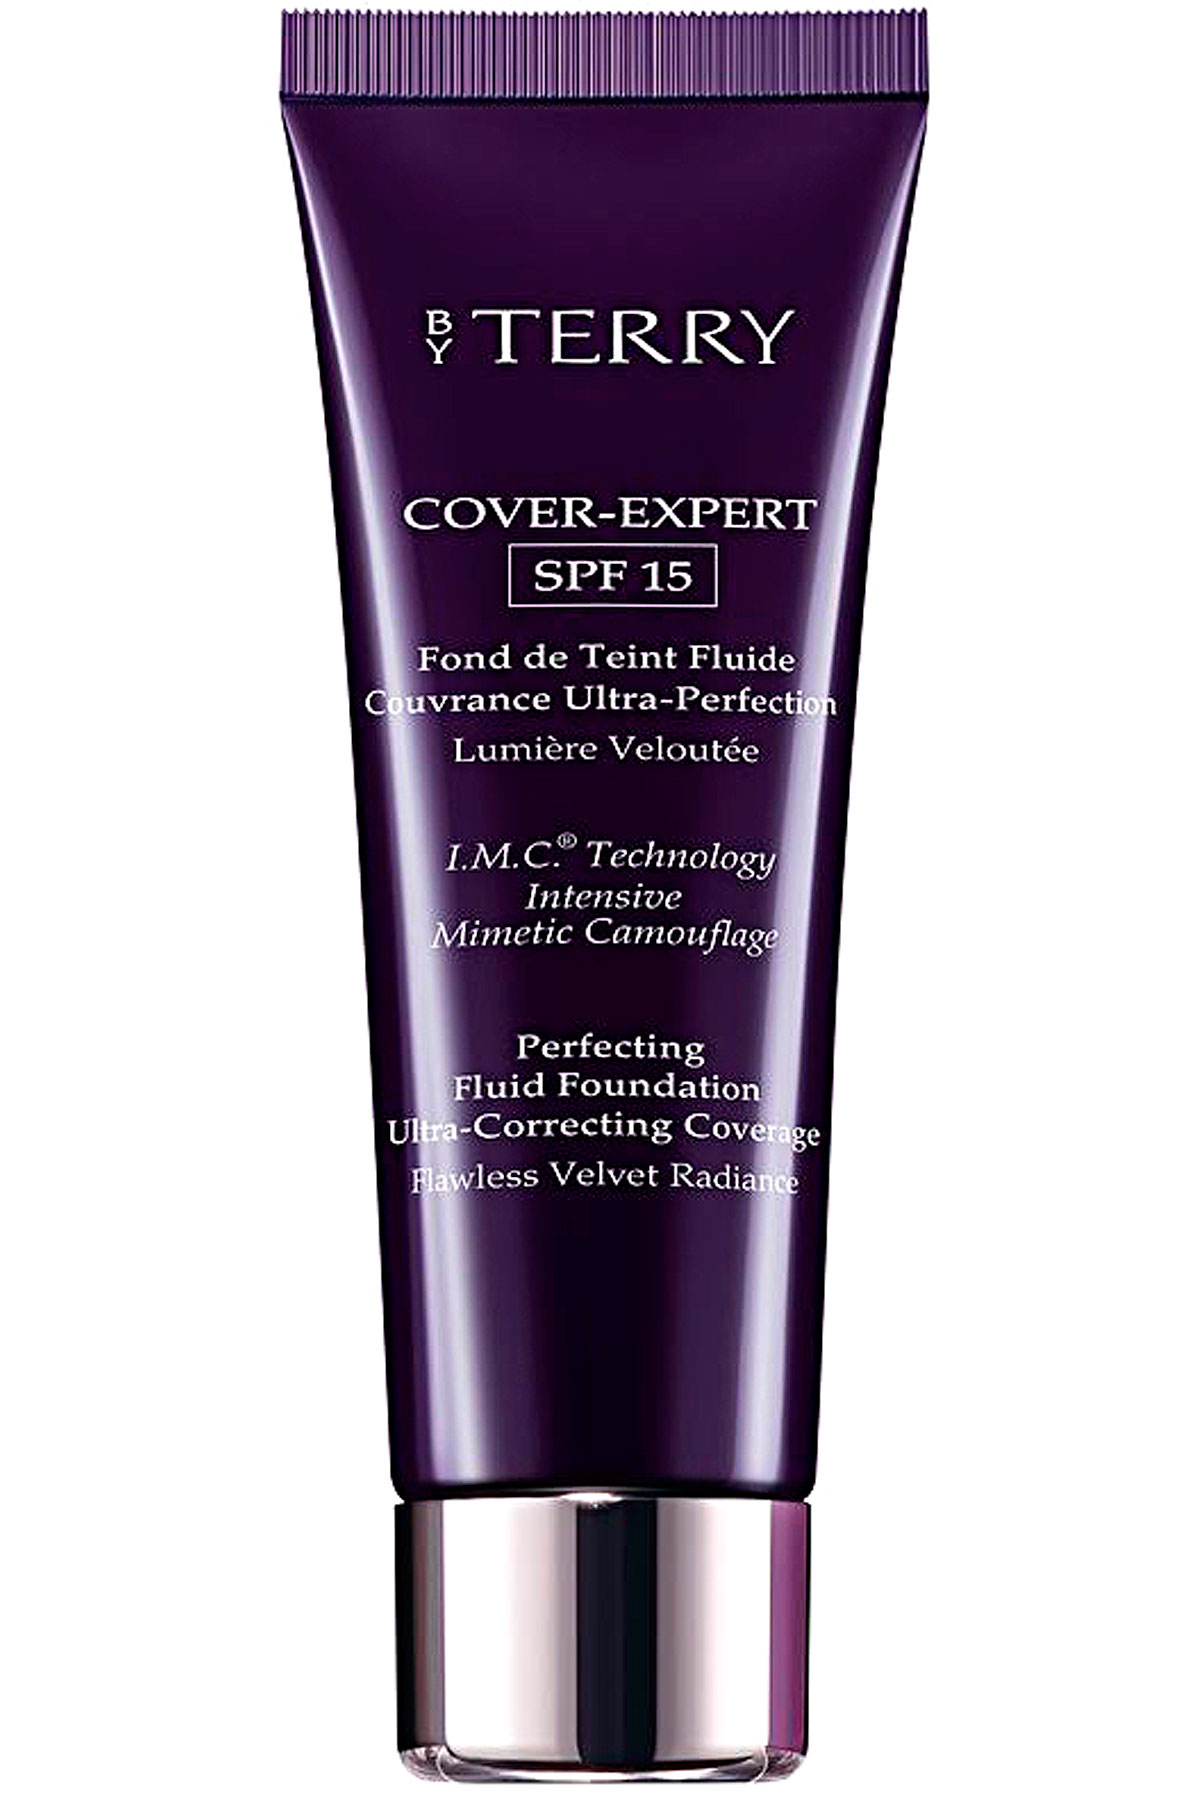 By Terry Makeup for Women, Cover-expert Spf15 - N.8 Intense Beige - 35 Ml, Intense Beige, 2019, 35 ml